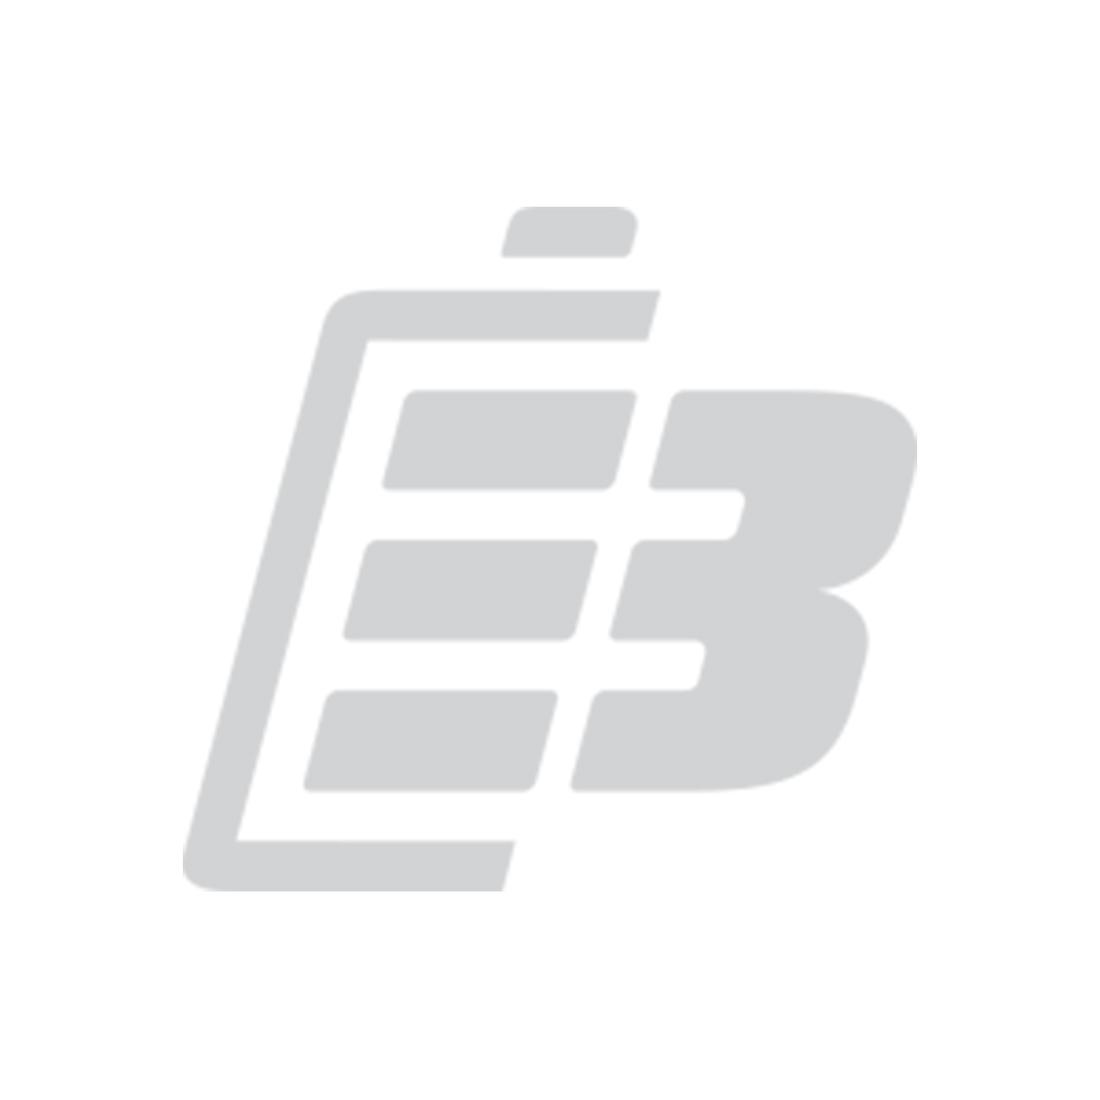 Laptop battery Compaq Presario CQ62_1